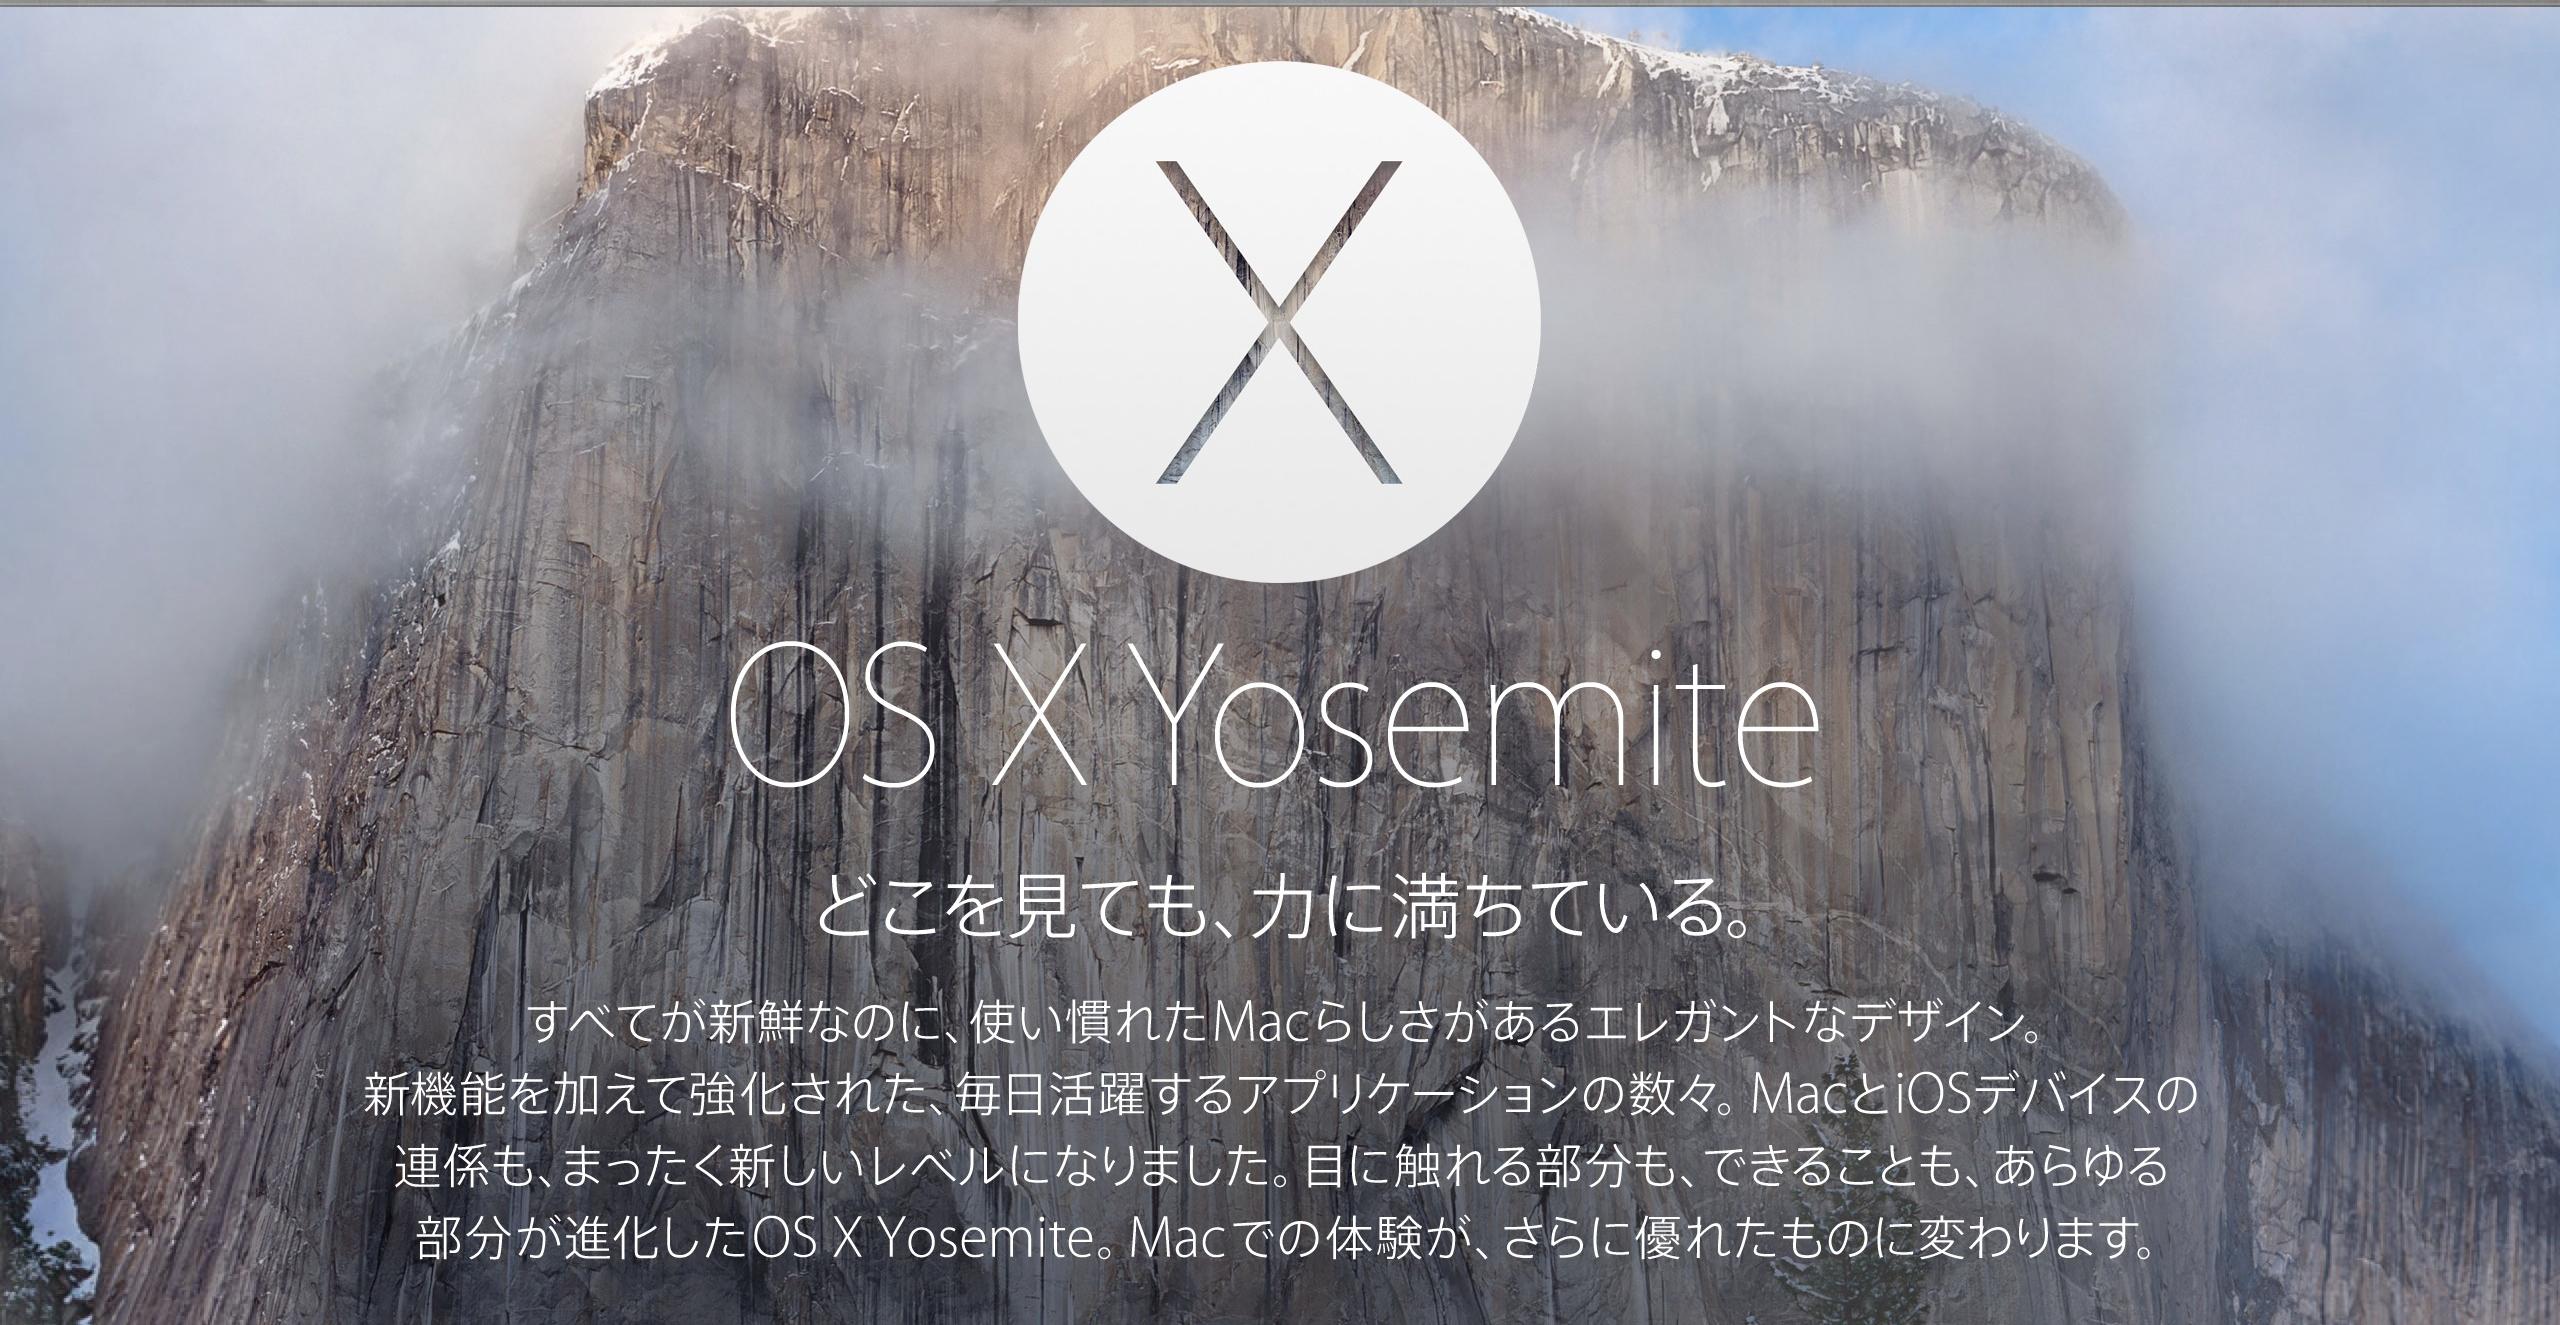 OS X Yosemite リリースに向けて (Part.2)